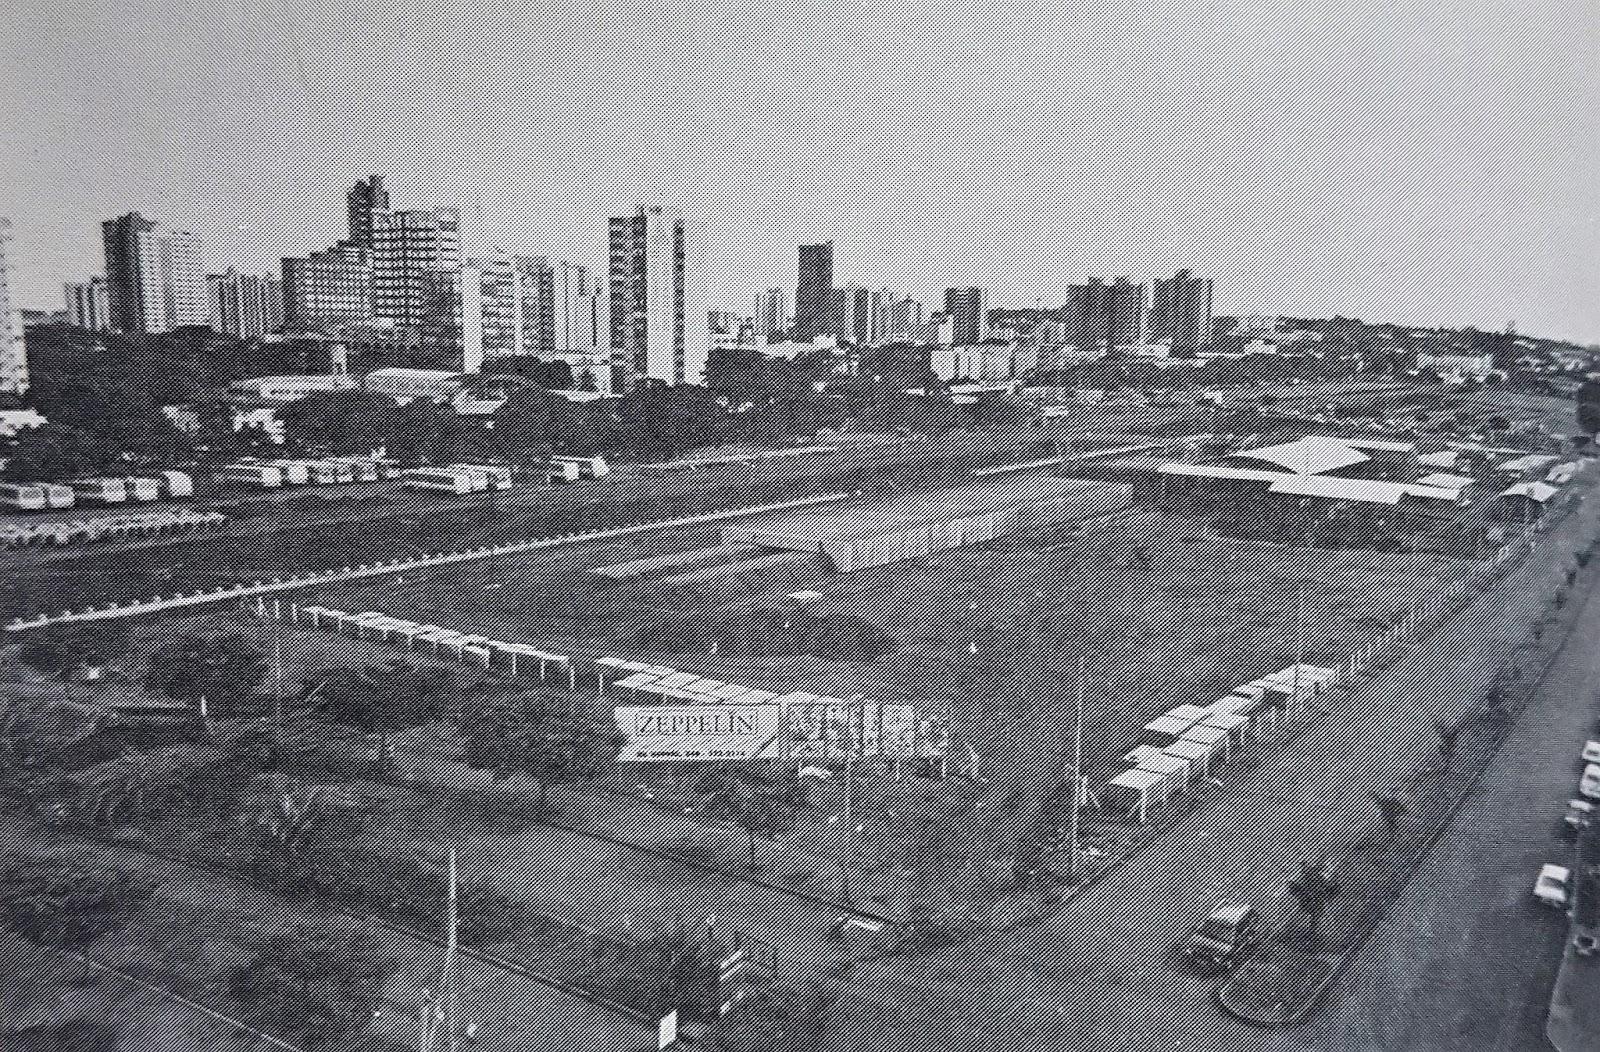 Novo Centro - 1996